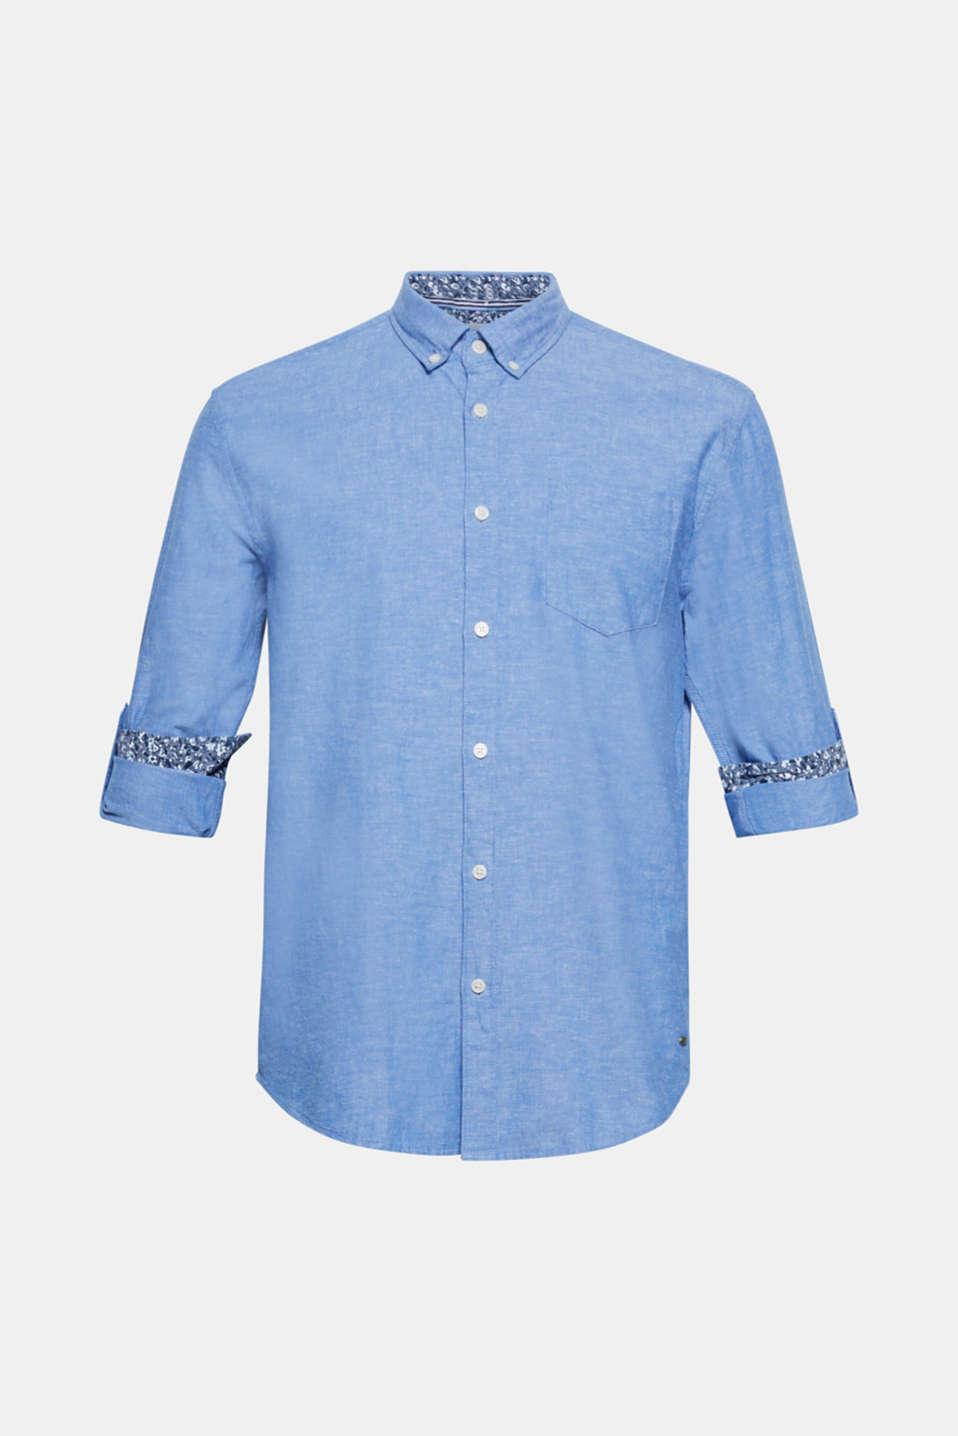 Shirts woven Regular fit, LIGHT BLUE, detail image number 7